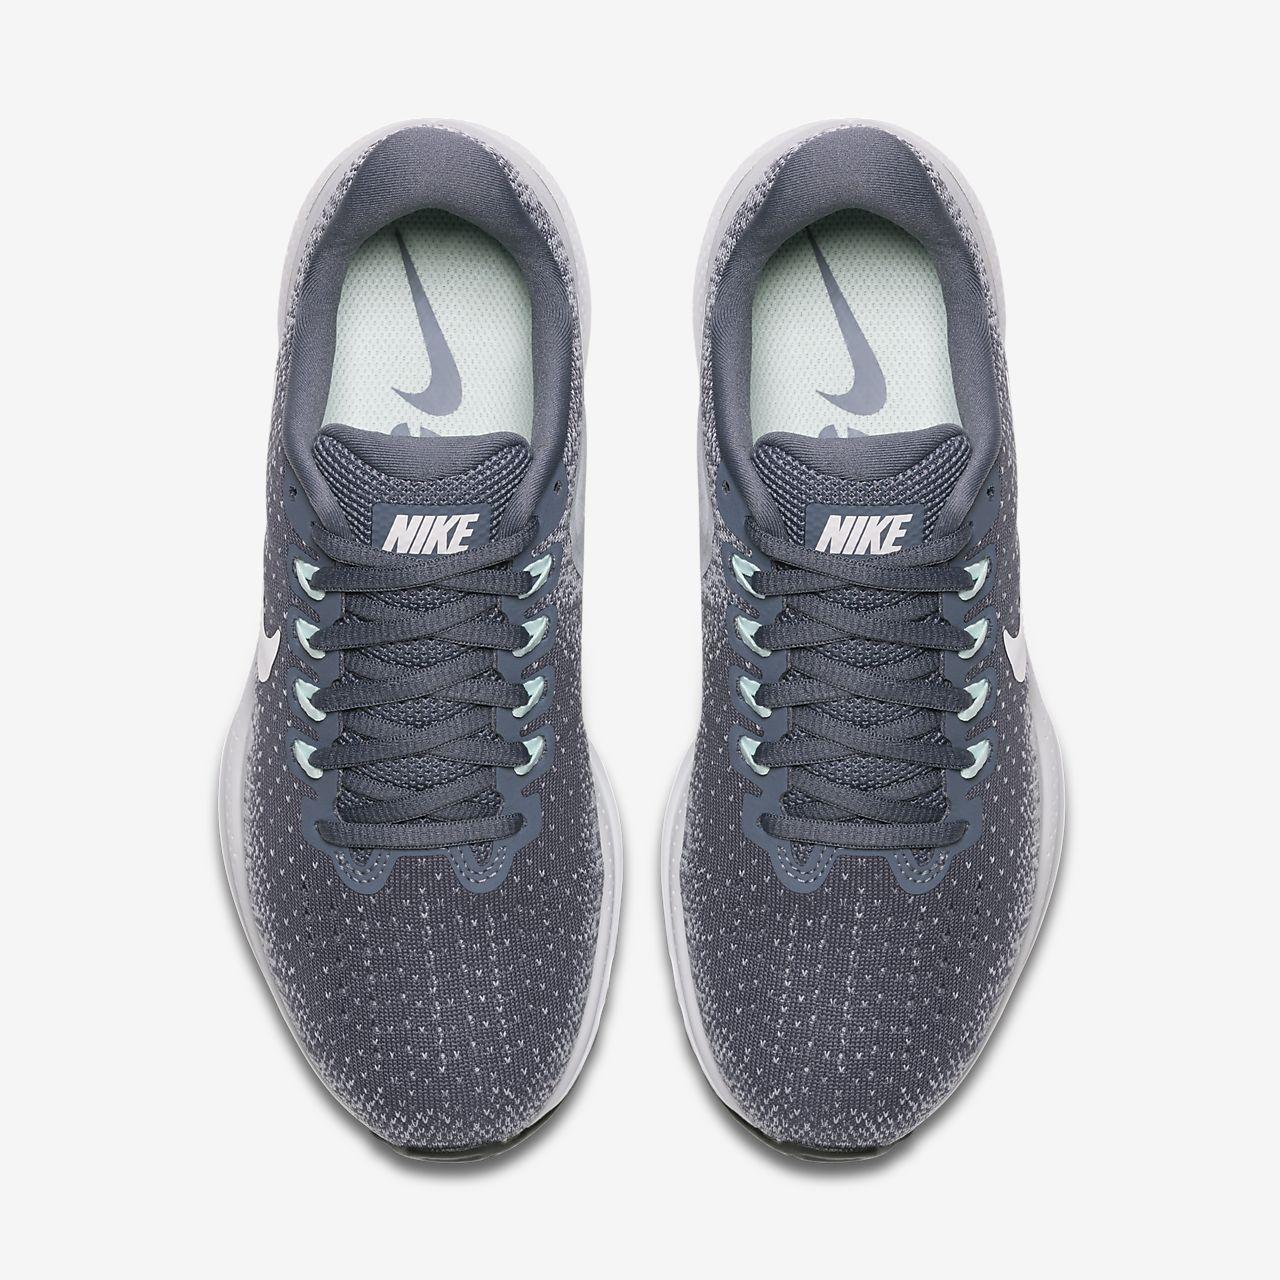 3e75cb675dc Nike Air Zoom Vomero 13 Zapatillas de running - Mujer. Nike.com ES